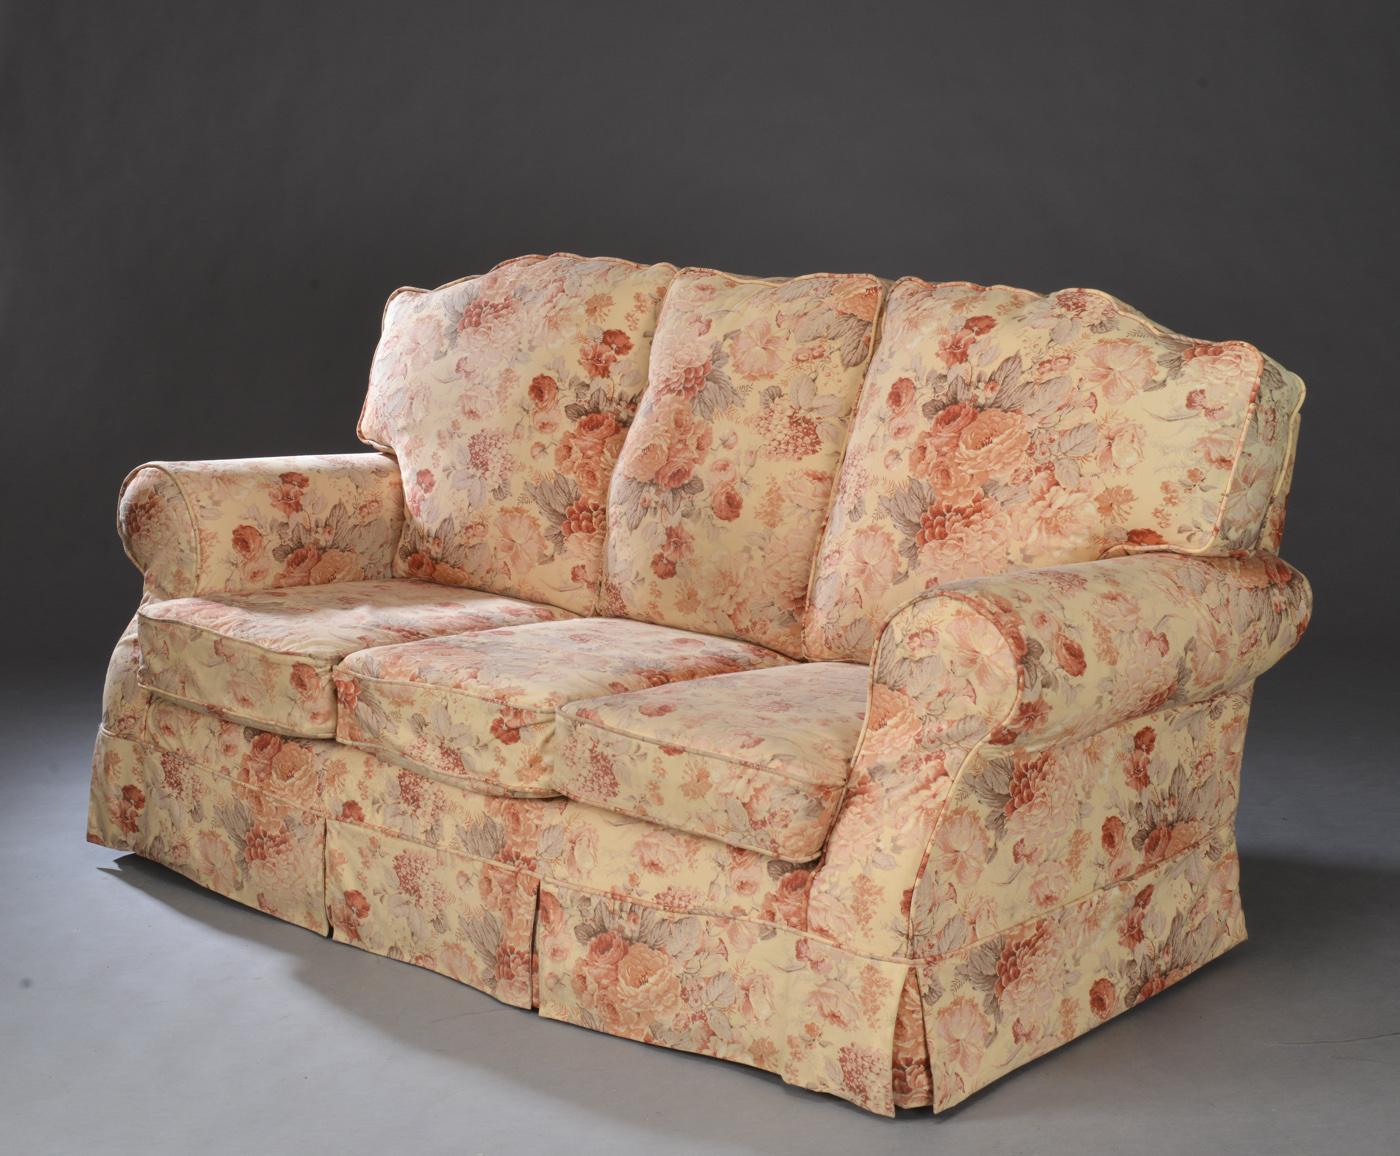 sofa stil excellent retro schlafsofa er sofa malma t loungesofa couch er jahre design grau. Black Bedroom Furniture Sets. Home Design Ideas